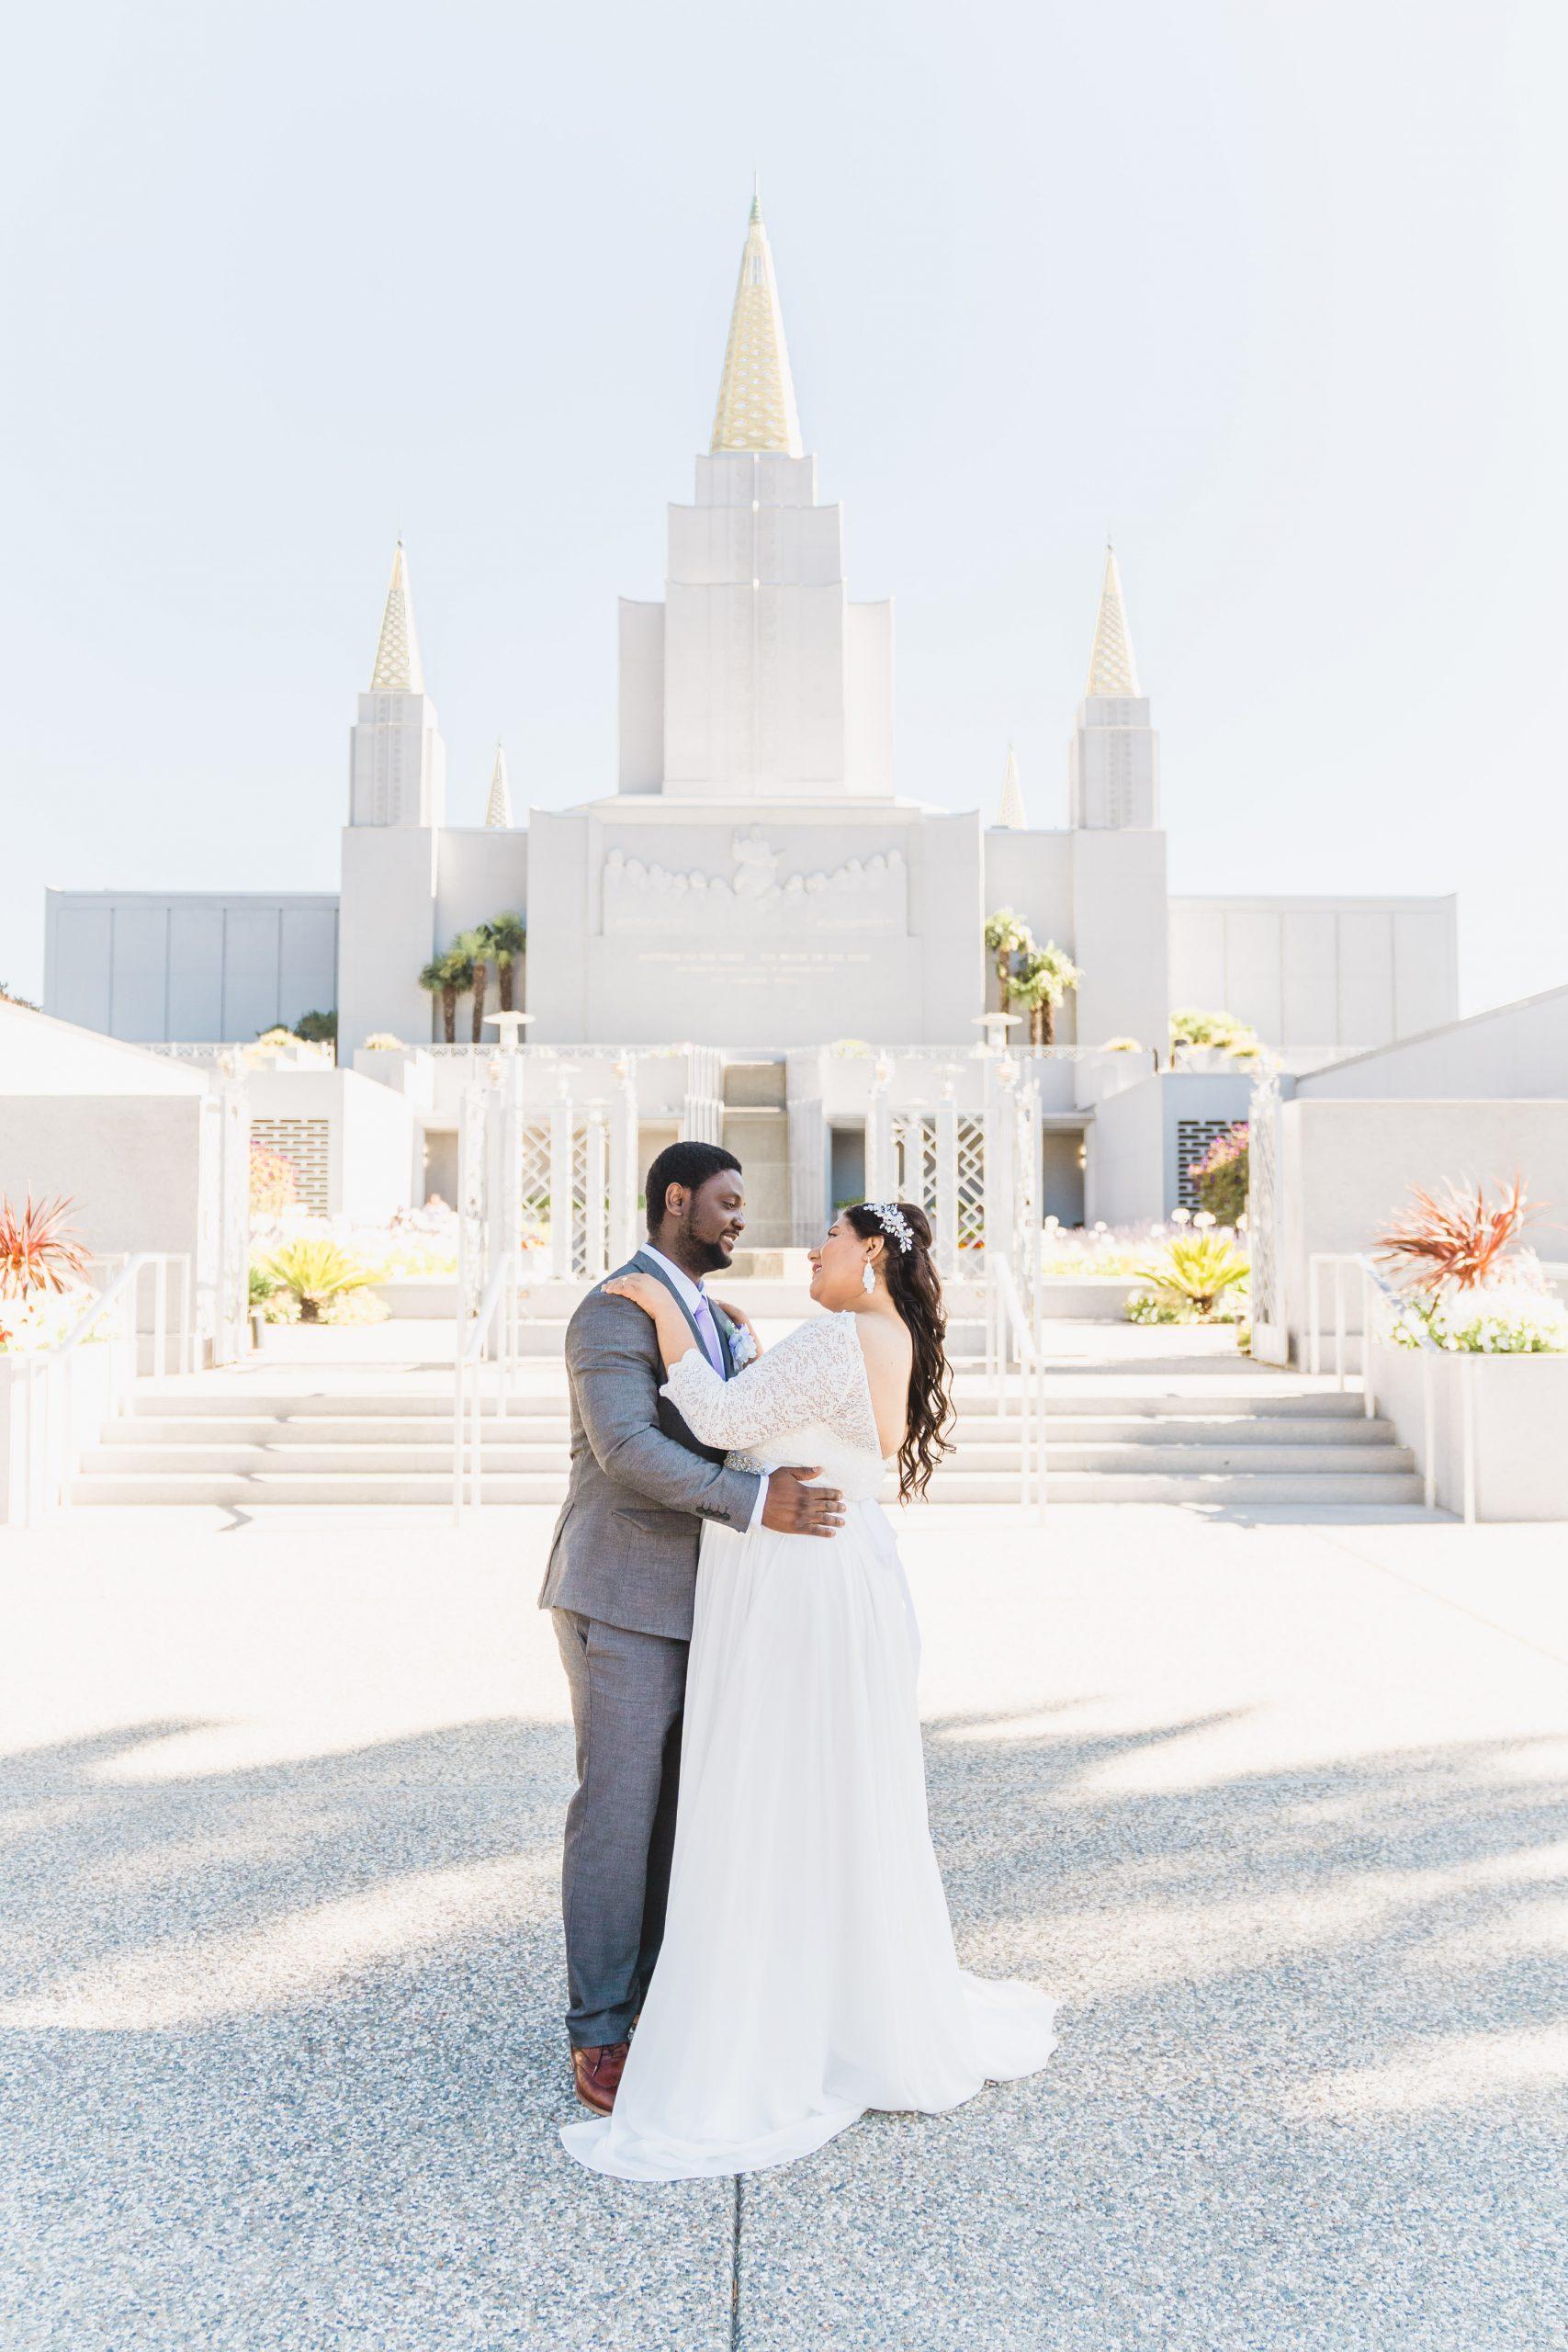 Wedding photoshoot at Oakland Temple